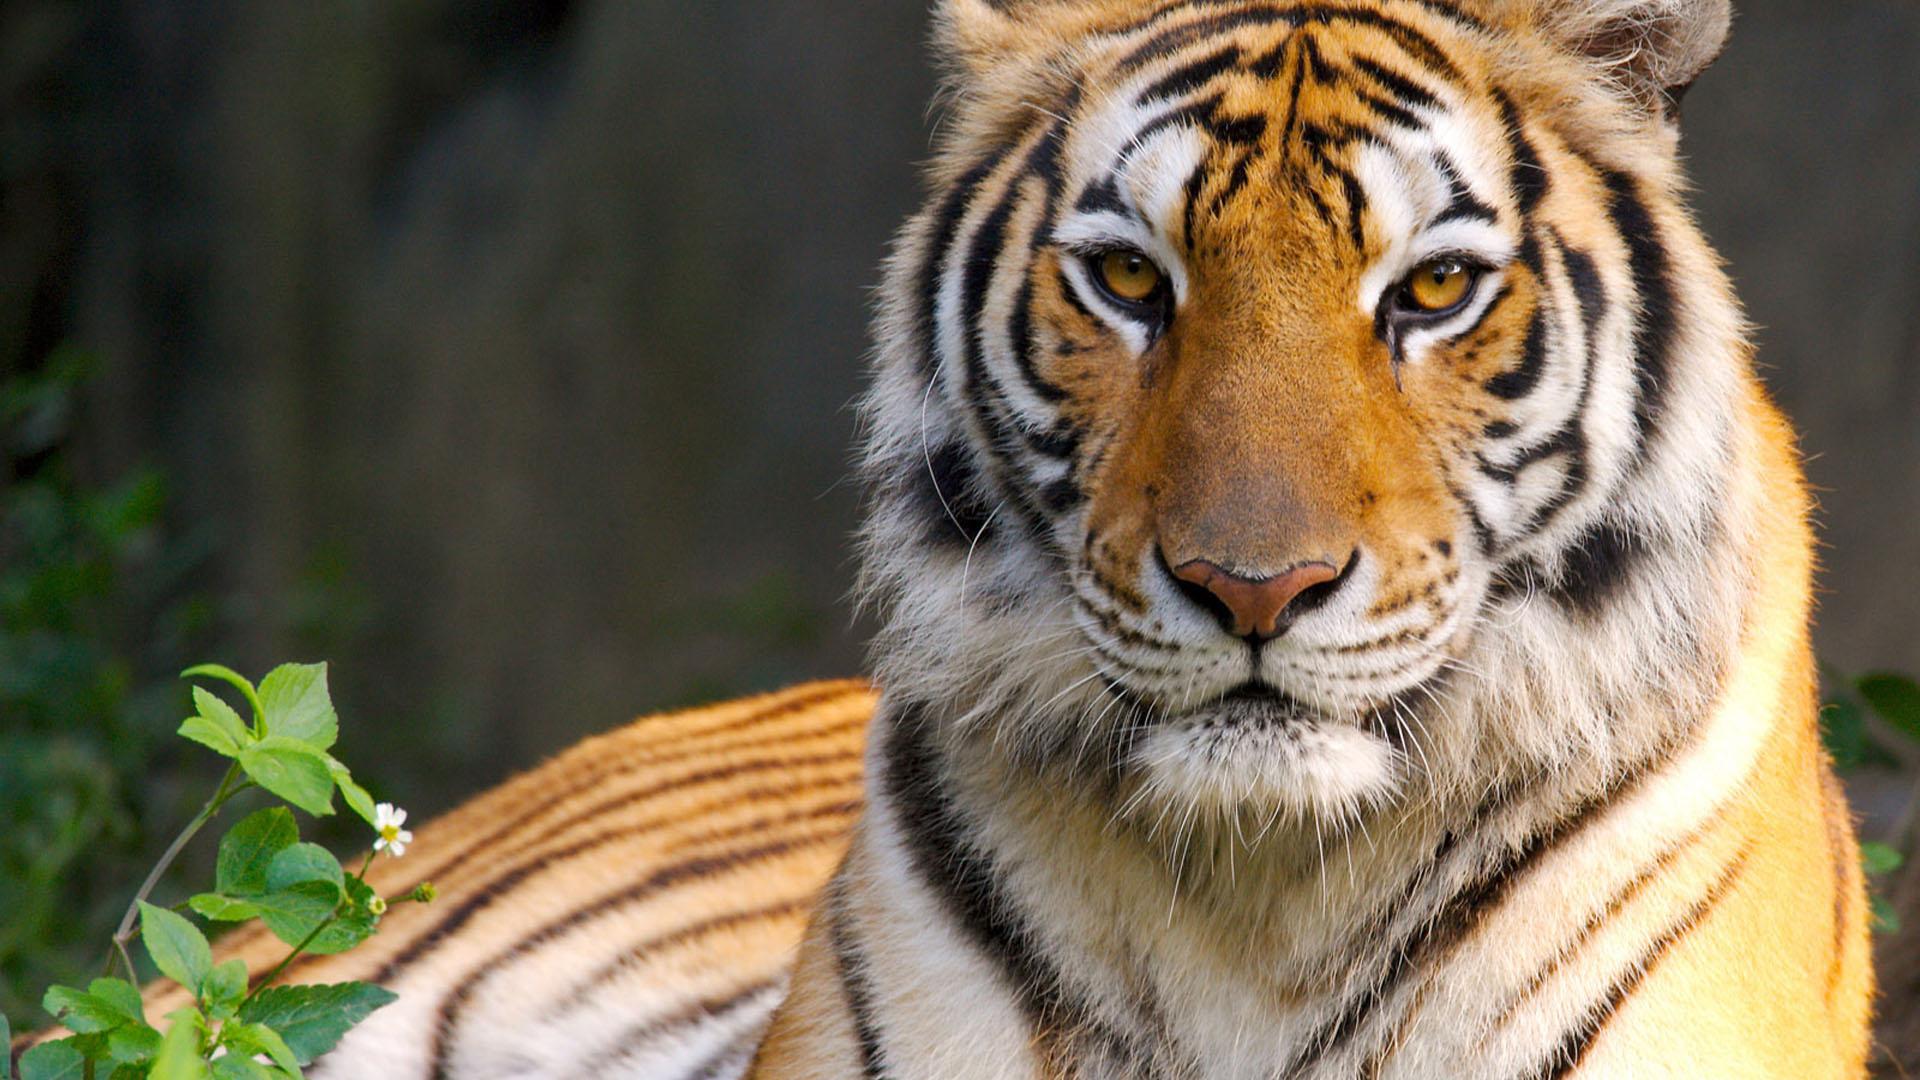 gorgeous tiger wallpaper 40404